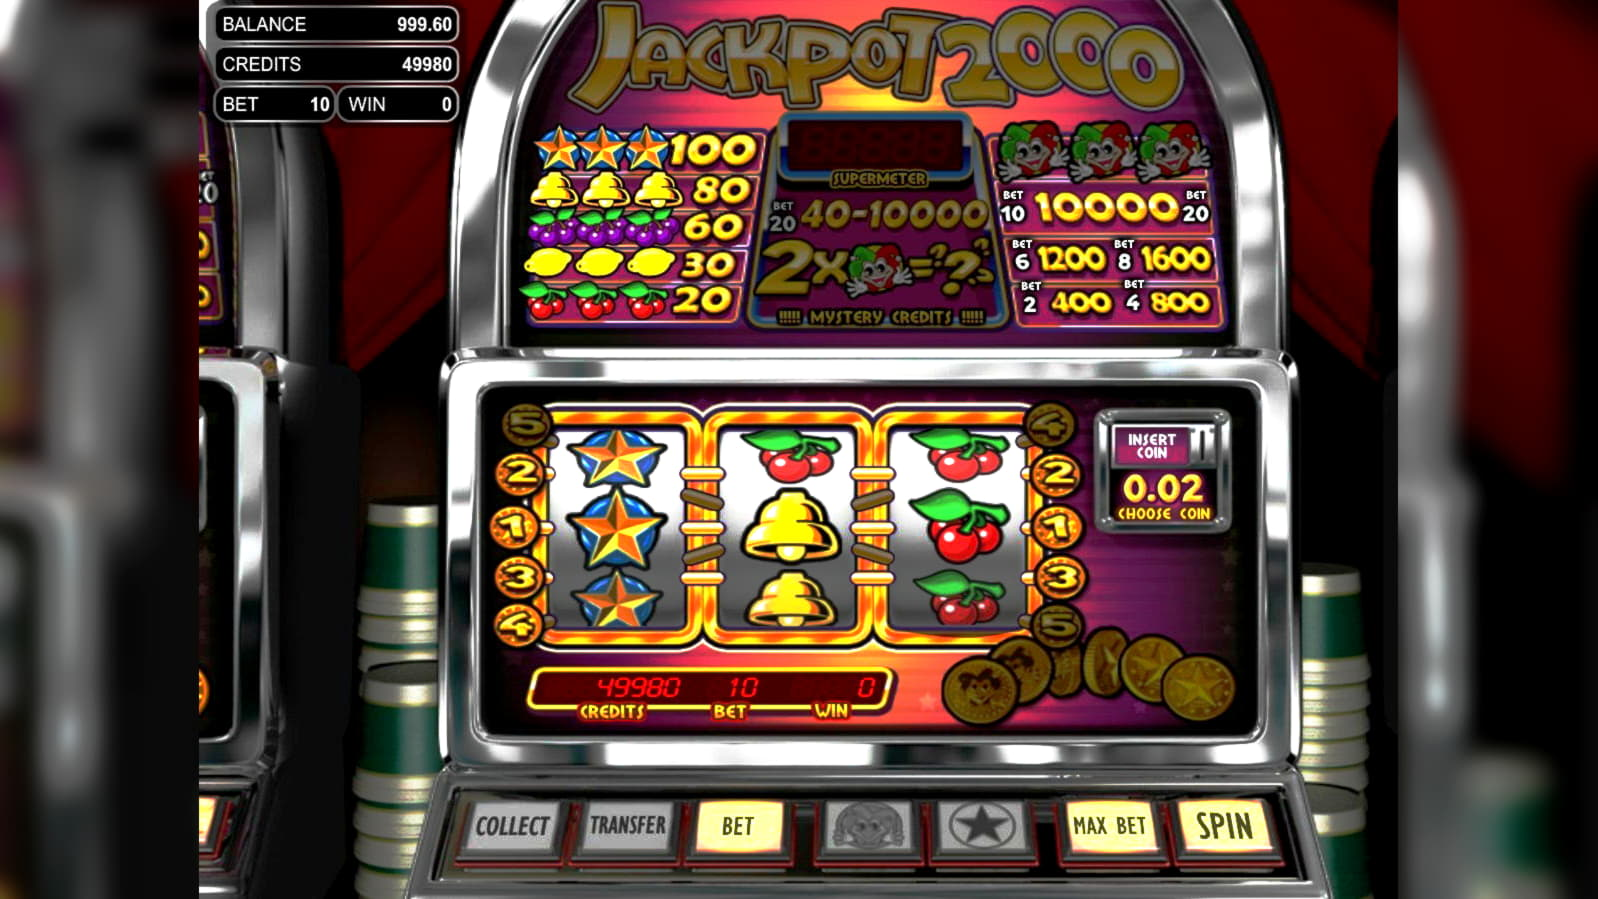 Free Bet No Deposit Roulette